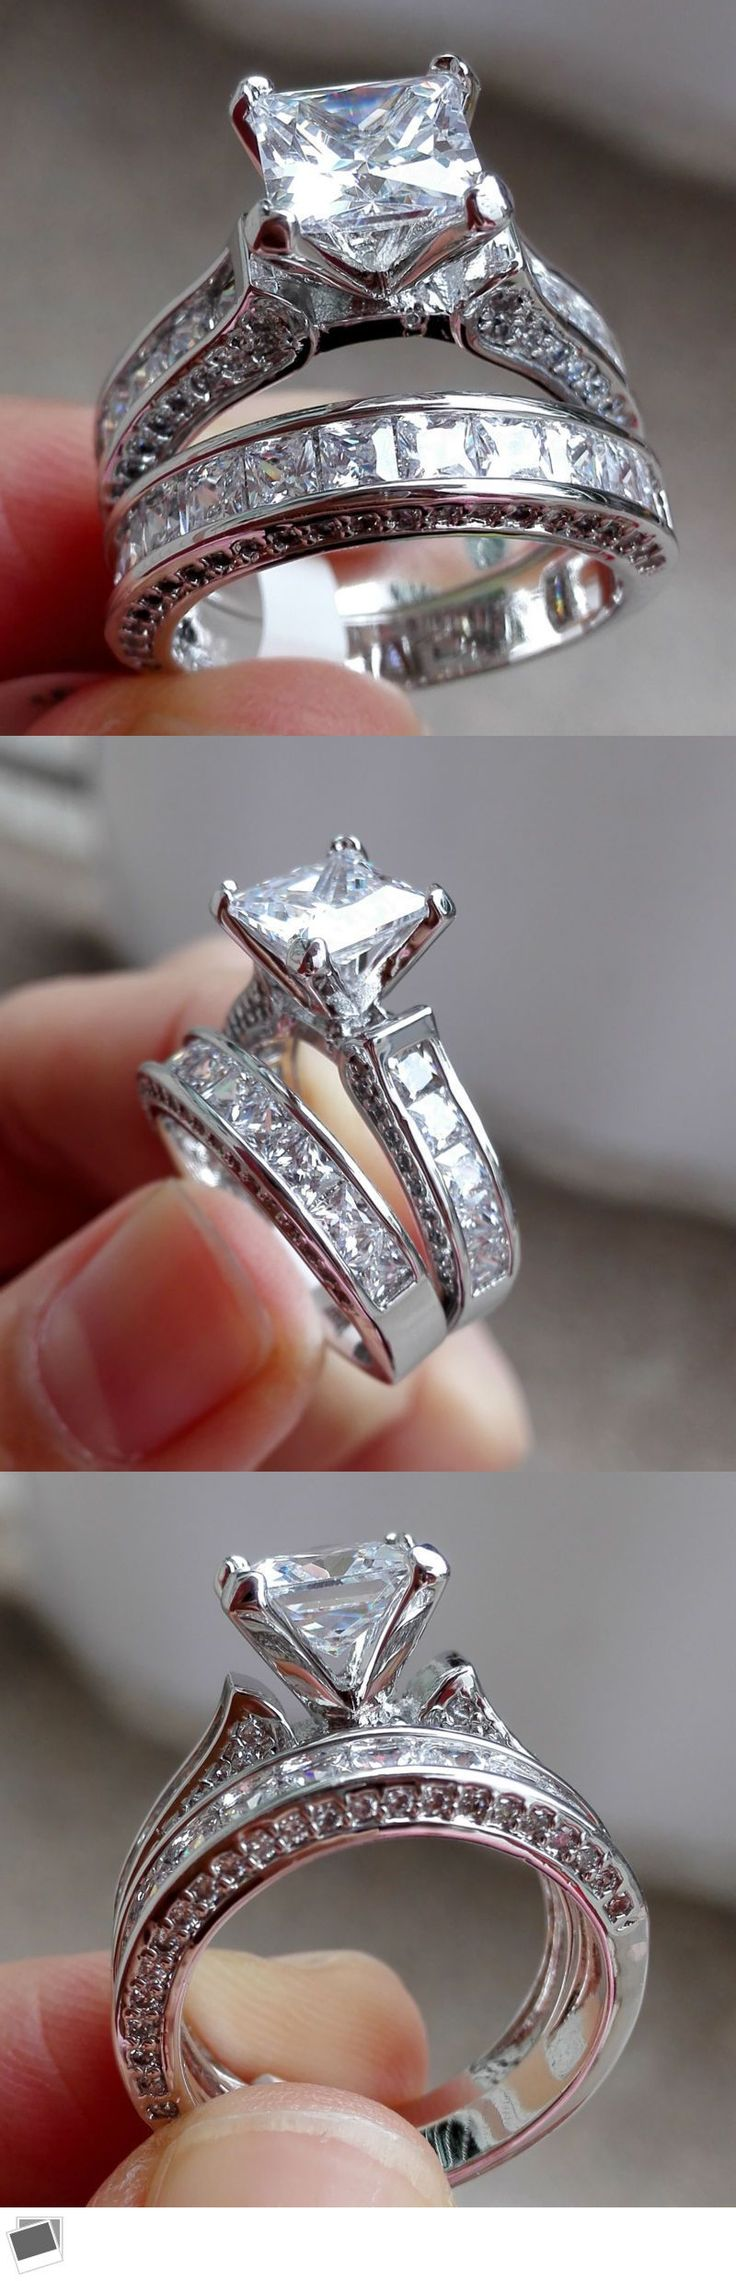 princess cut wedding rings princess cut wedding rings Rings 3 Ct Princess Cut Cz Solid Sterling Silver Wedding Engagement Ring 2